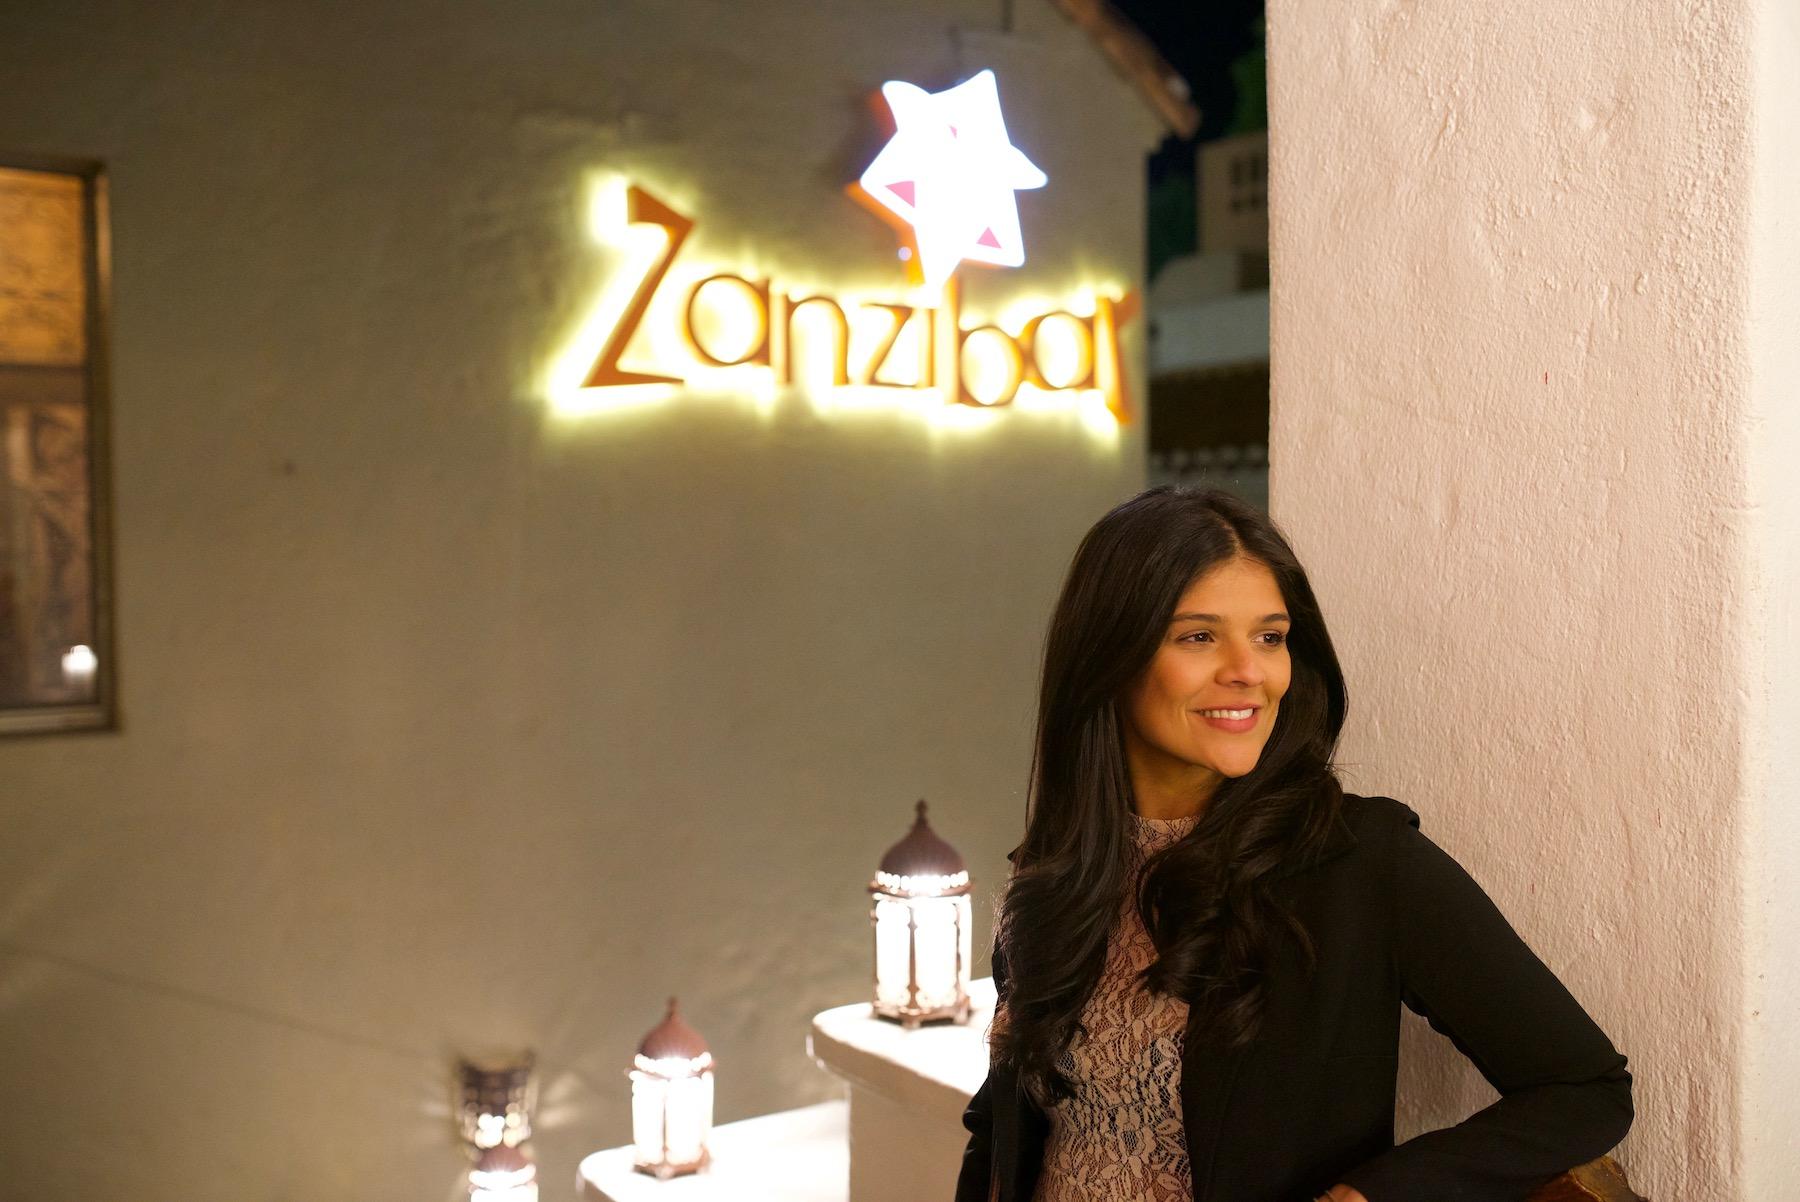 jantar-restaurante-zanzibar-santiago-chile-13